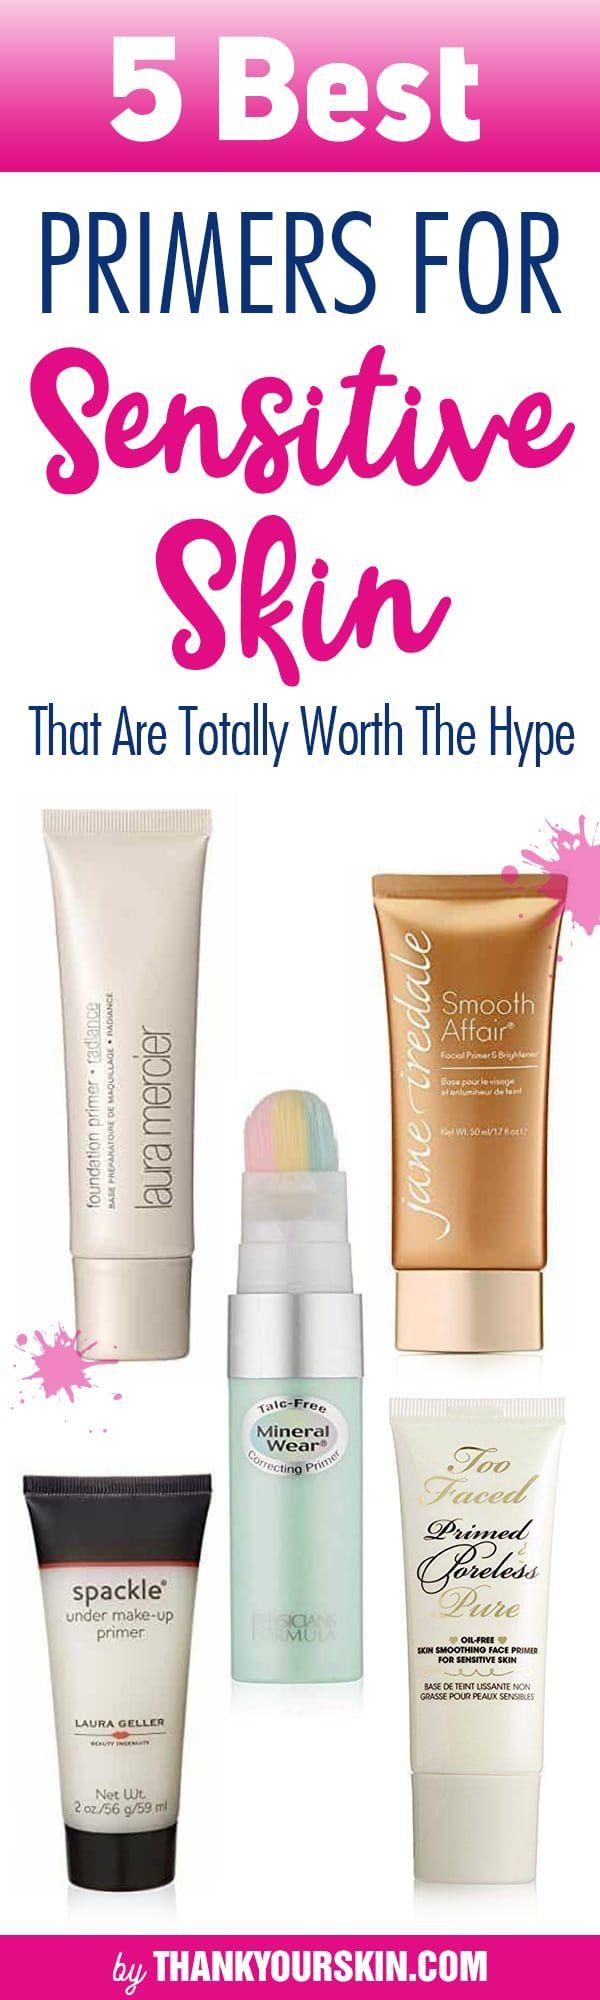 Best Primer for Sensitive Skin How to apply Primer